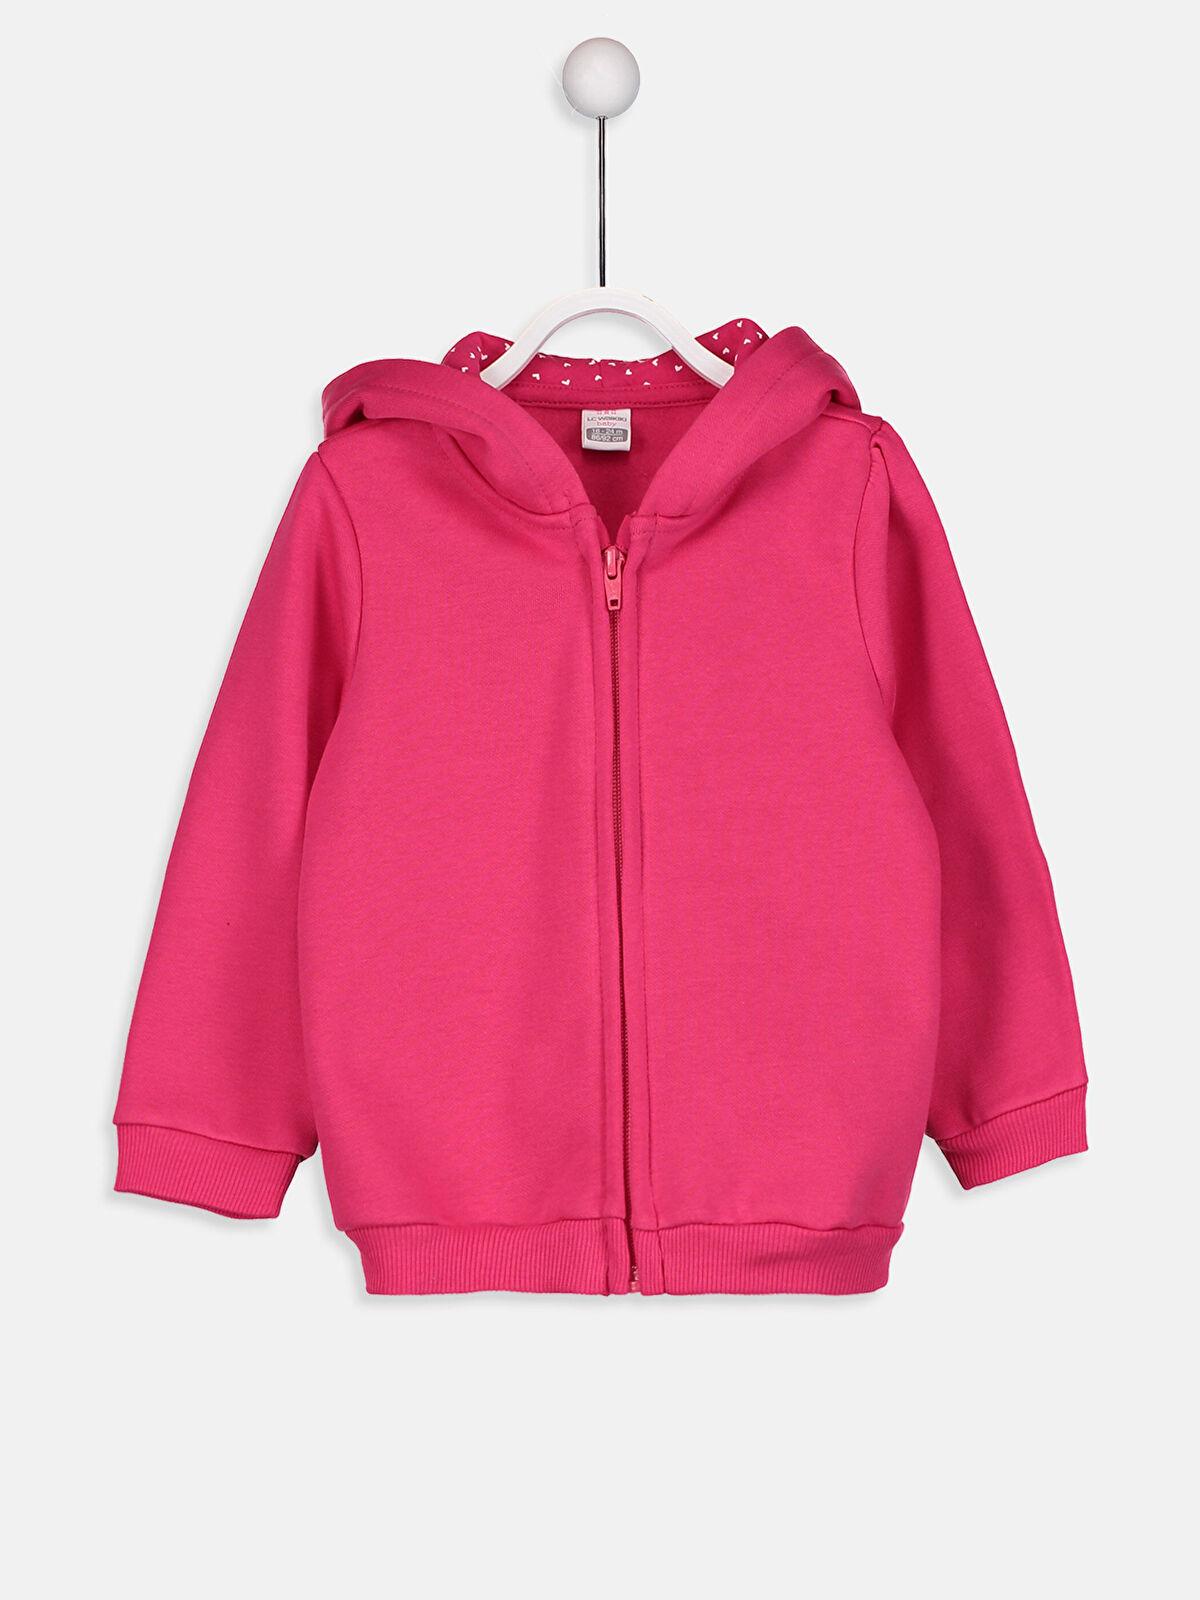 Kız Bebek Kapüşonlu Fermuarlı Sweatshirt - LC WAIKIKI